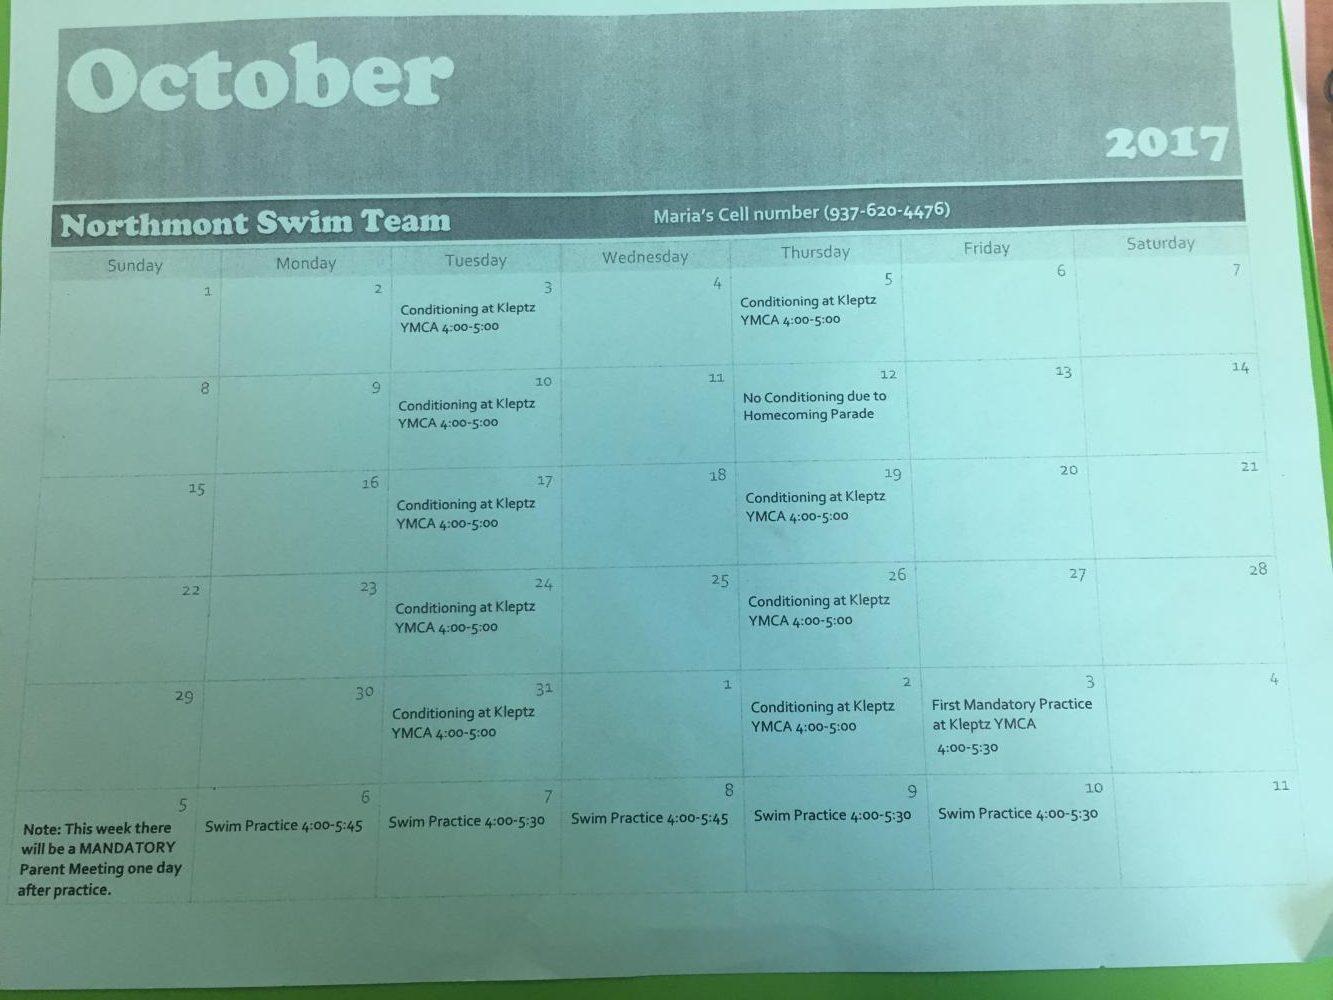 Sophomore+Jasmine+Johnston%27s+first+schedule+for+the+swim+year.+